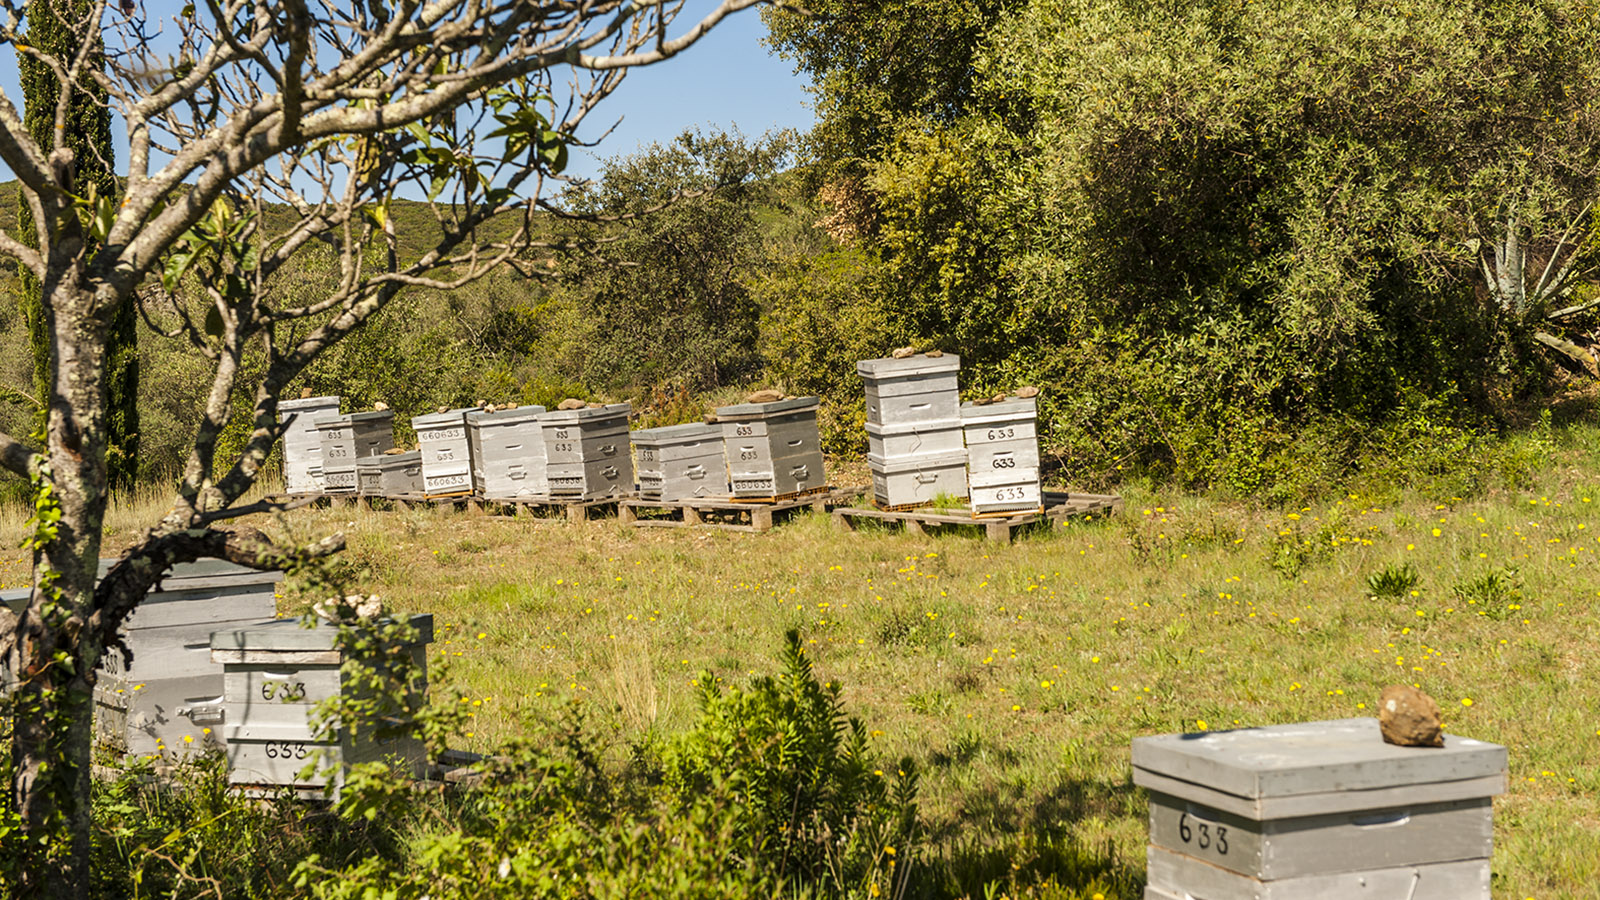 Unterwegs beim Wandern entdeckt: lauter Bienenkörbe. Foto: Hilke Maunder